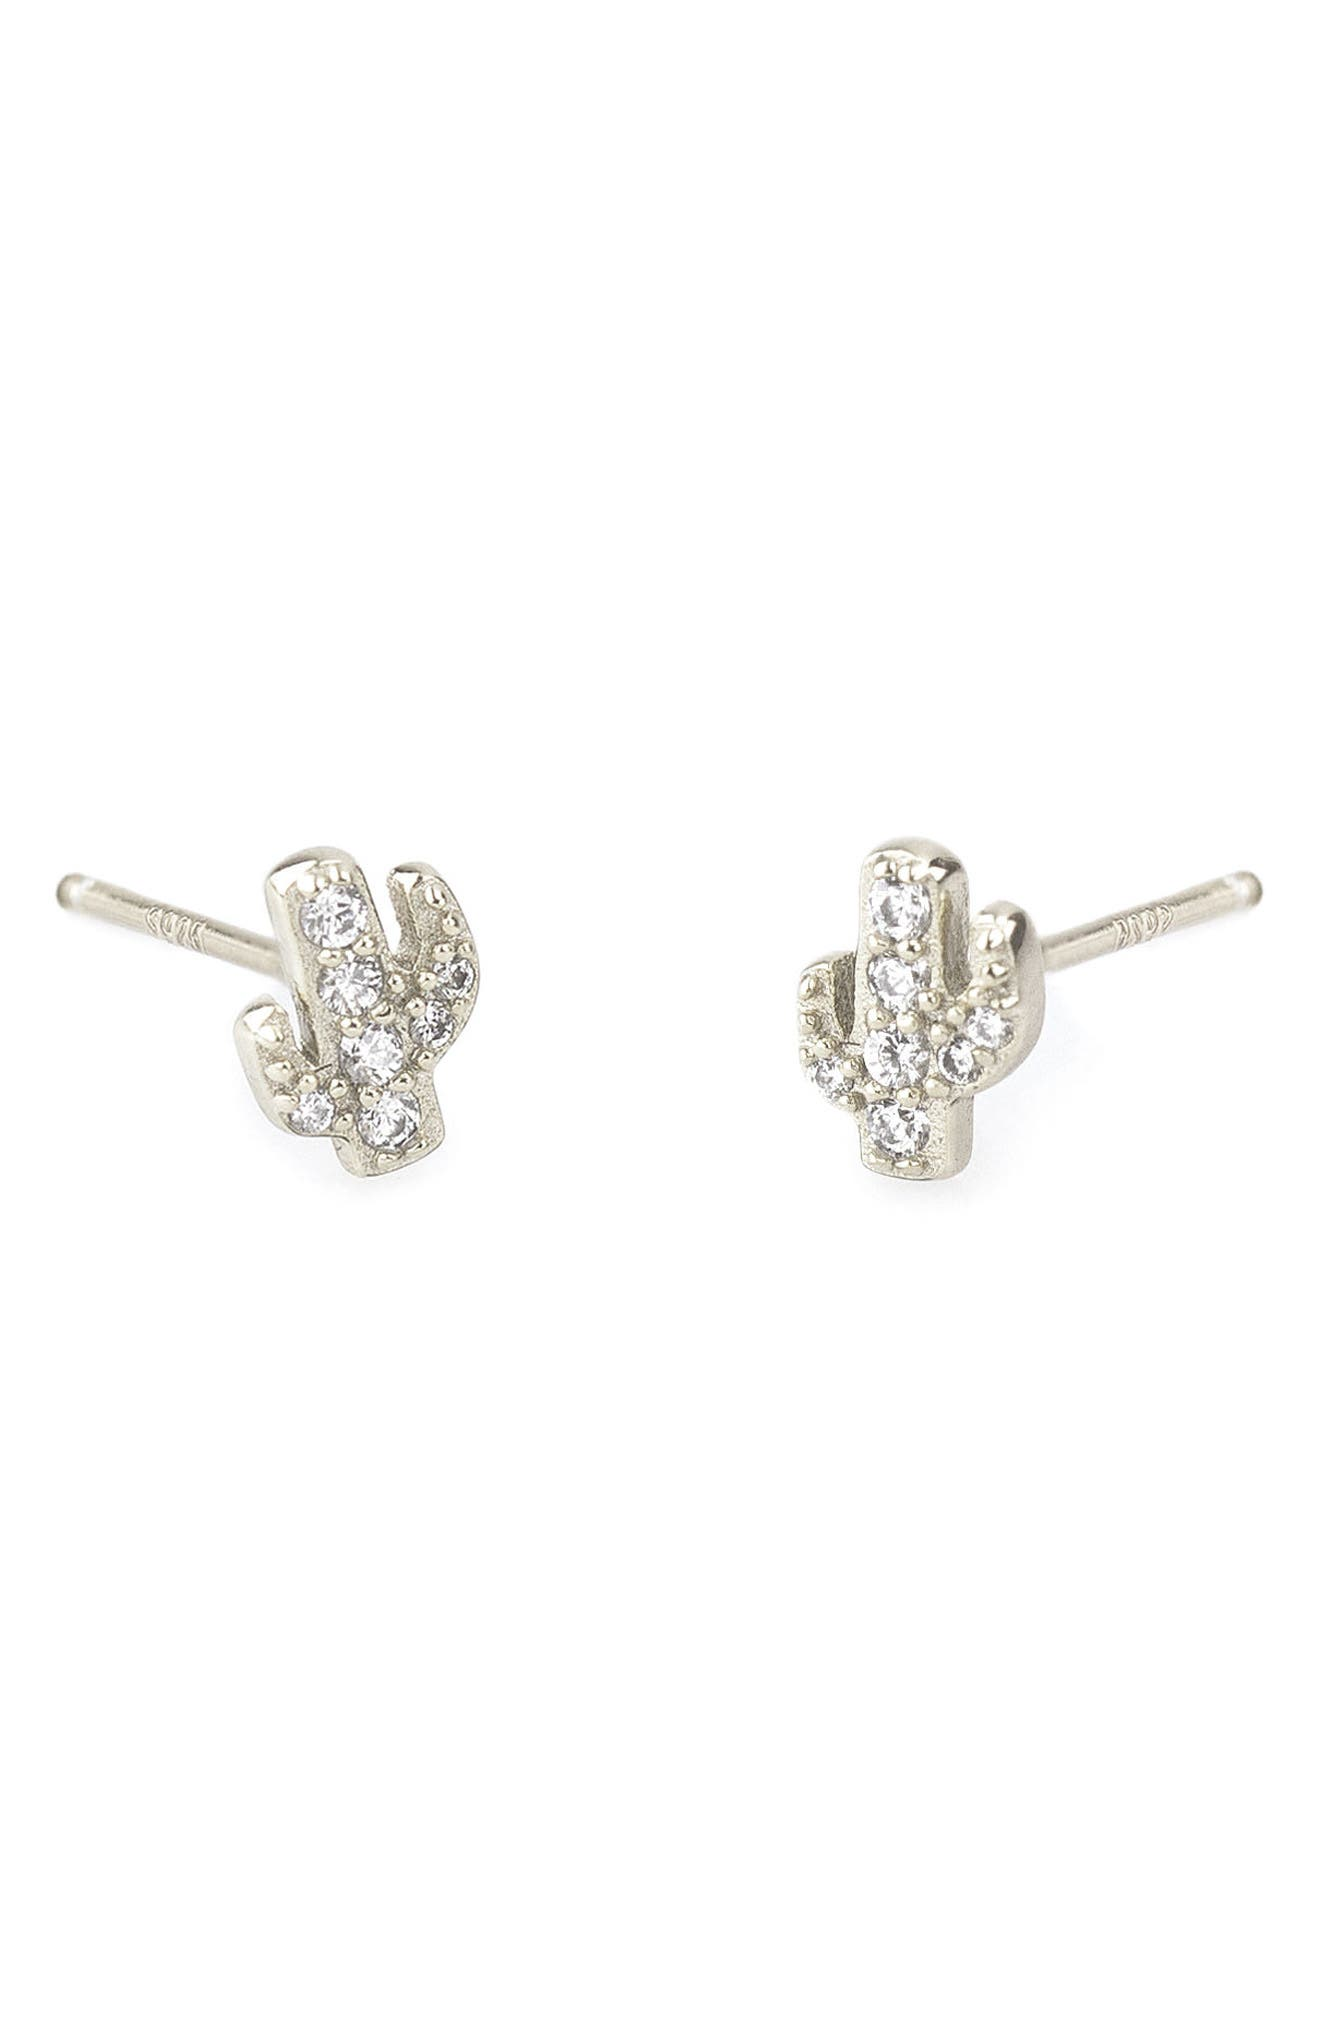 Main Image - Kris Nations Pavé Cactus Stud Earrings